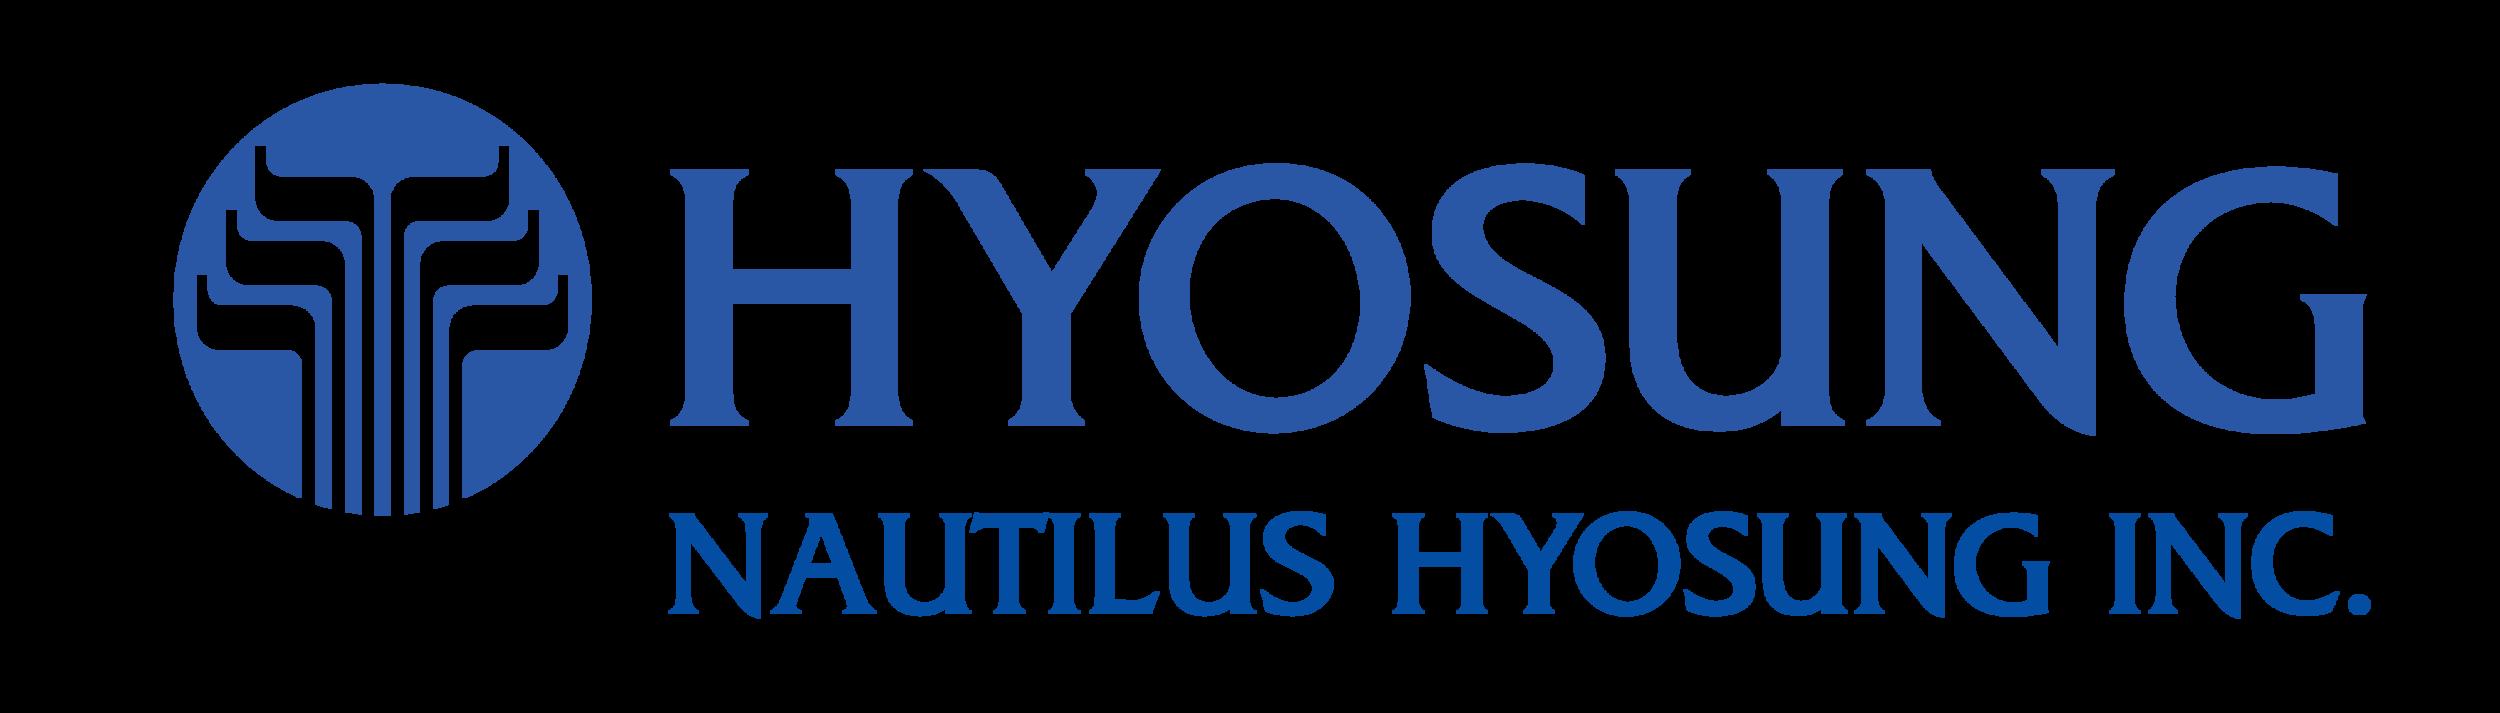 nautilus-hyosung.png